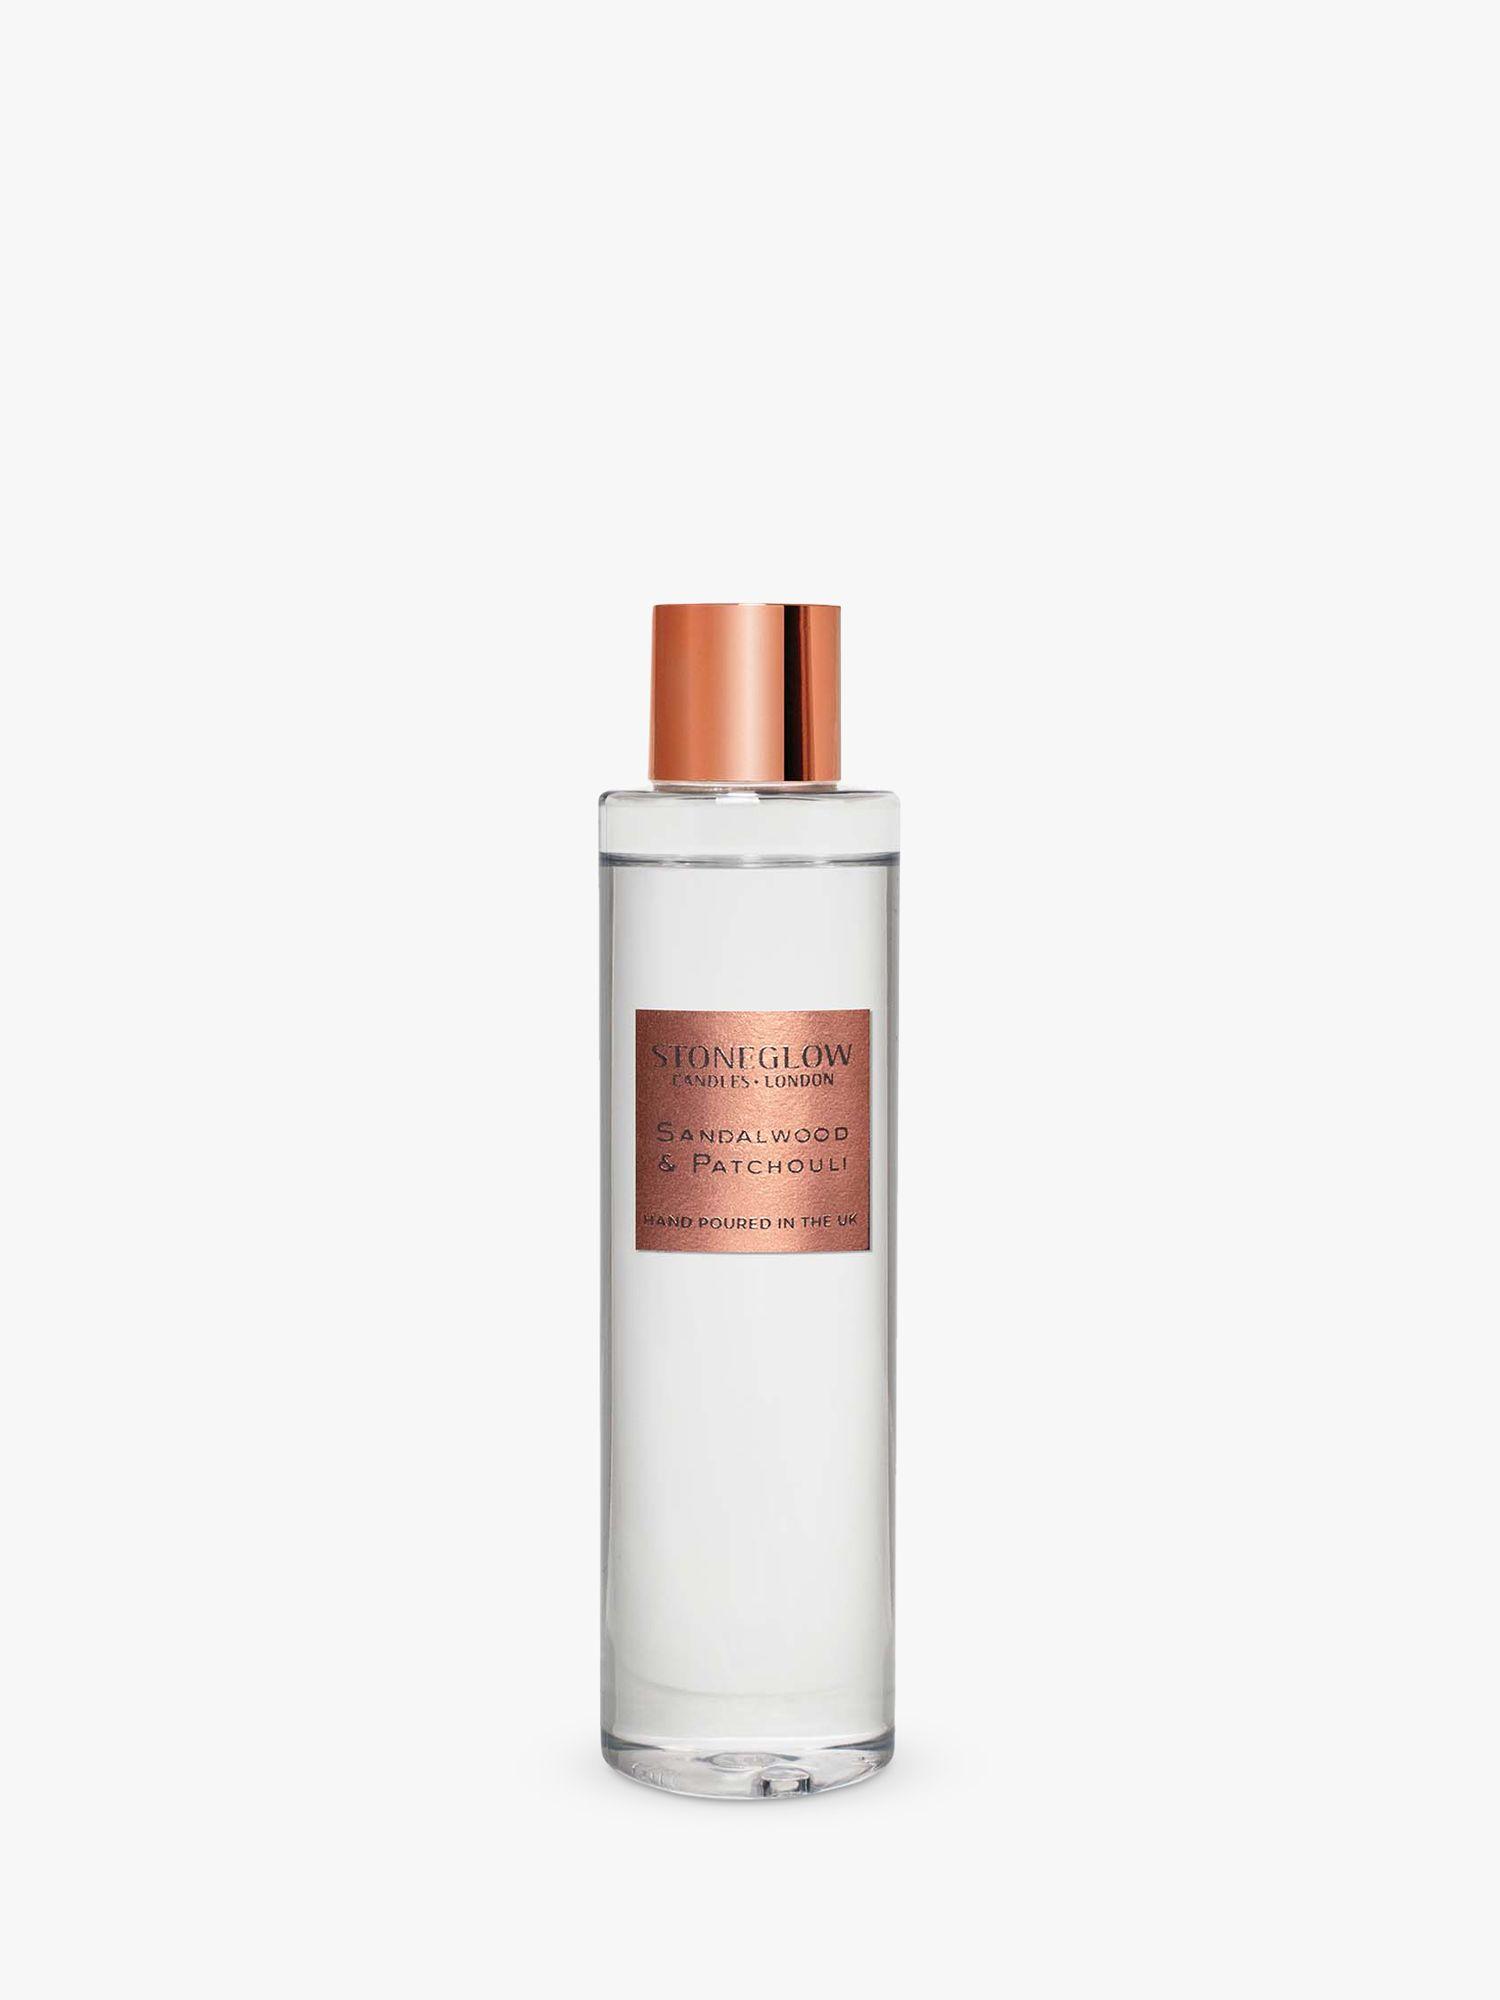 Stoneglow Stoneglow Luna Sandalwood & Patchouli Diffuser Refill, 200ml